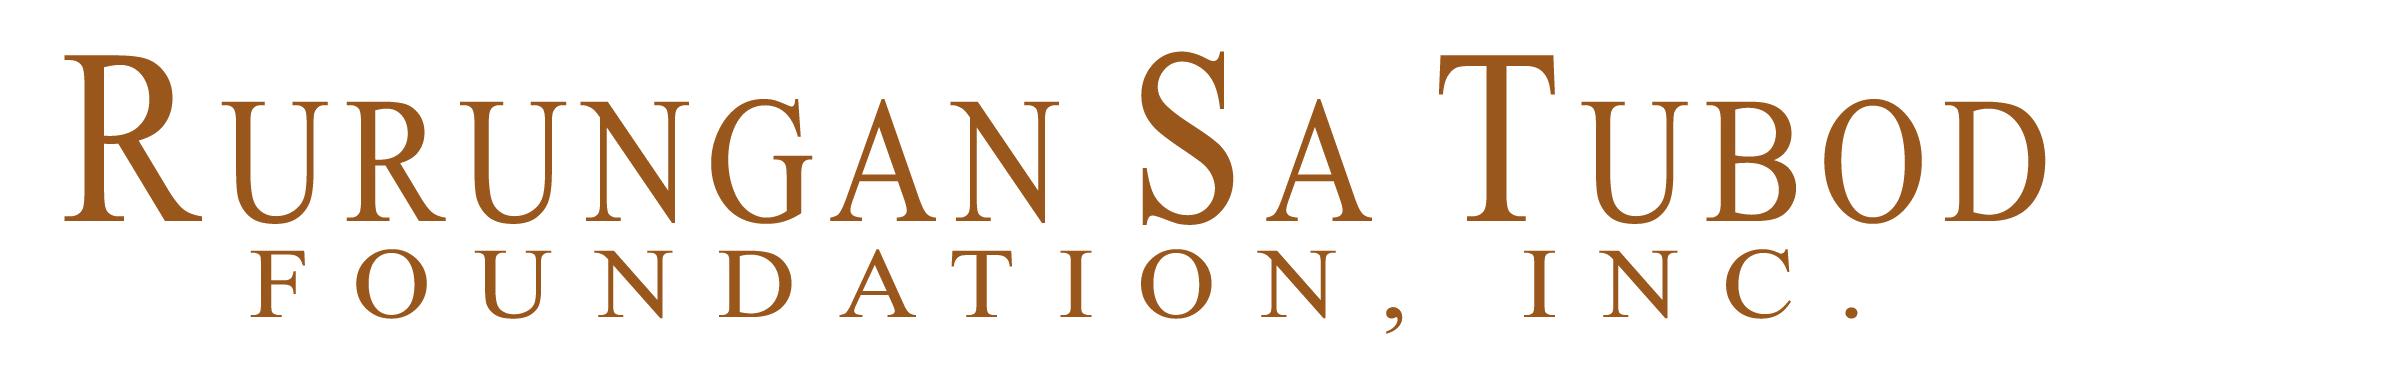 Rurungan sa Tubod Foundation Logo